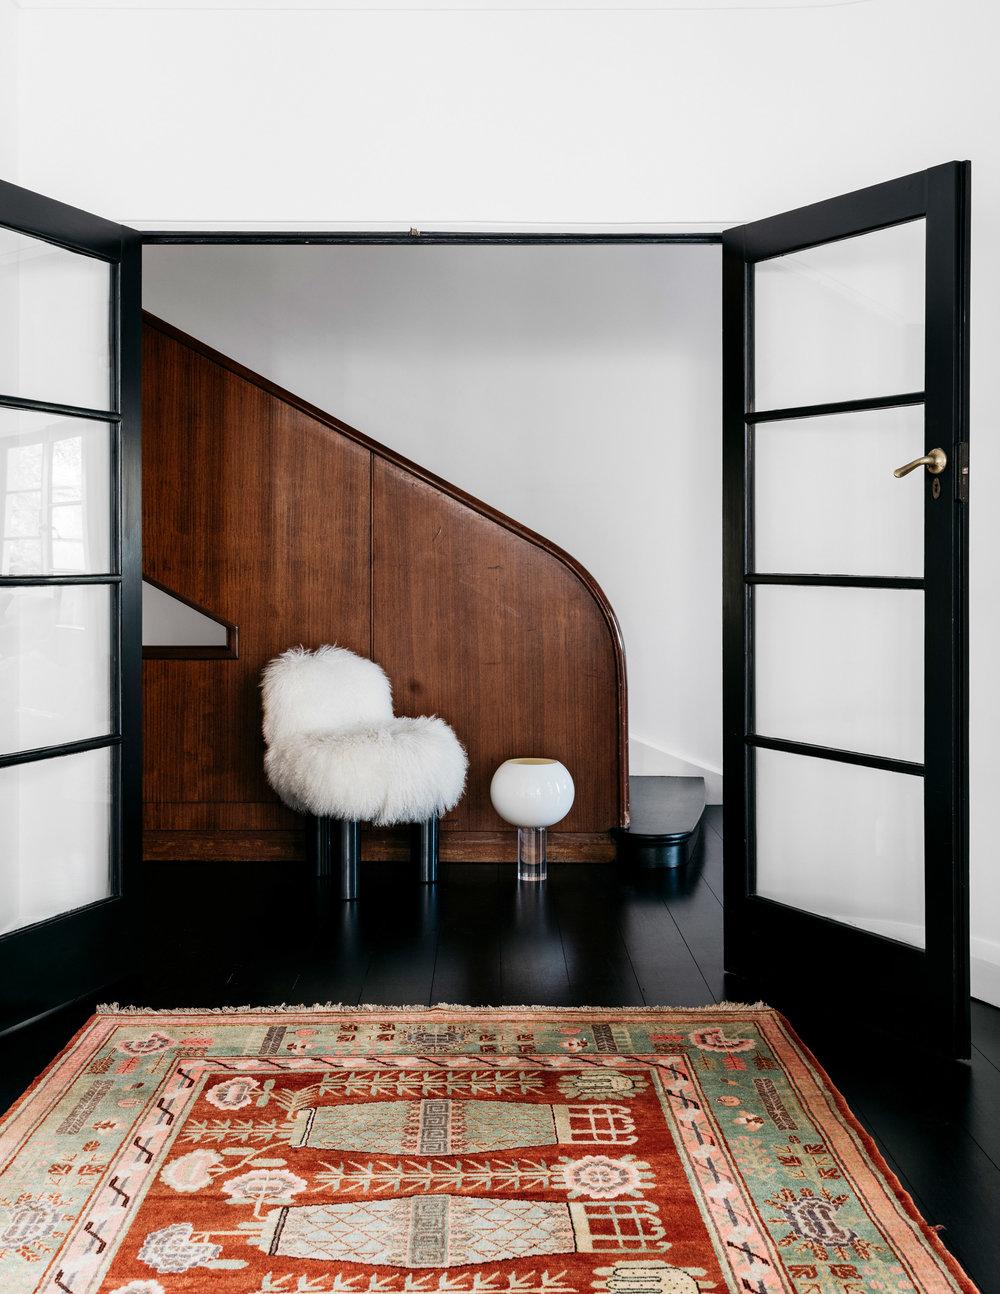 curatorial-house-arent-pyke-interiors-residential-australia-sydney_dezeen_2364_col_7.jpg